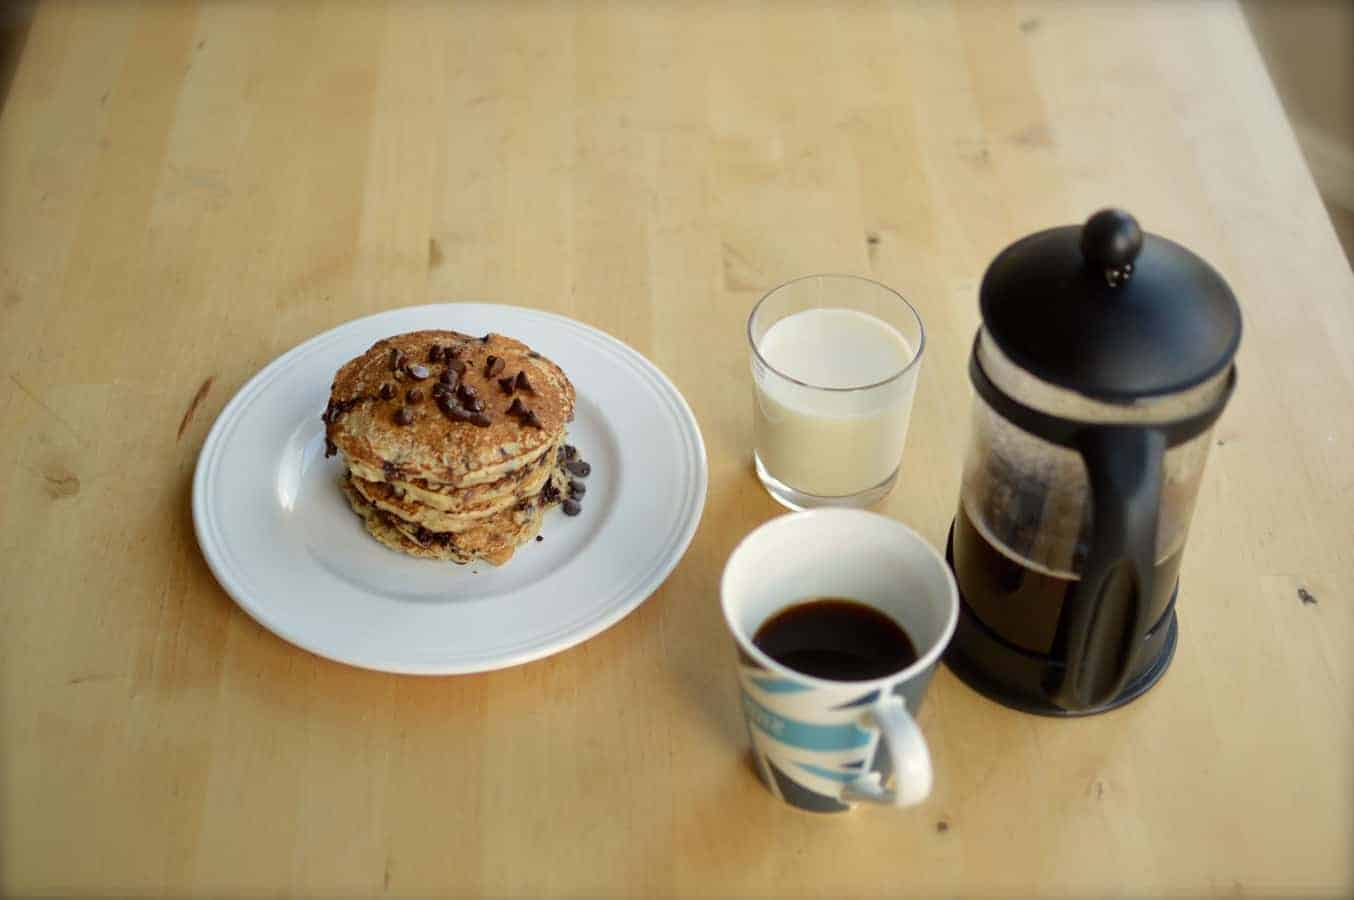 Chocolate Banana & Oat Pancakes